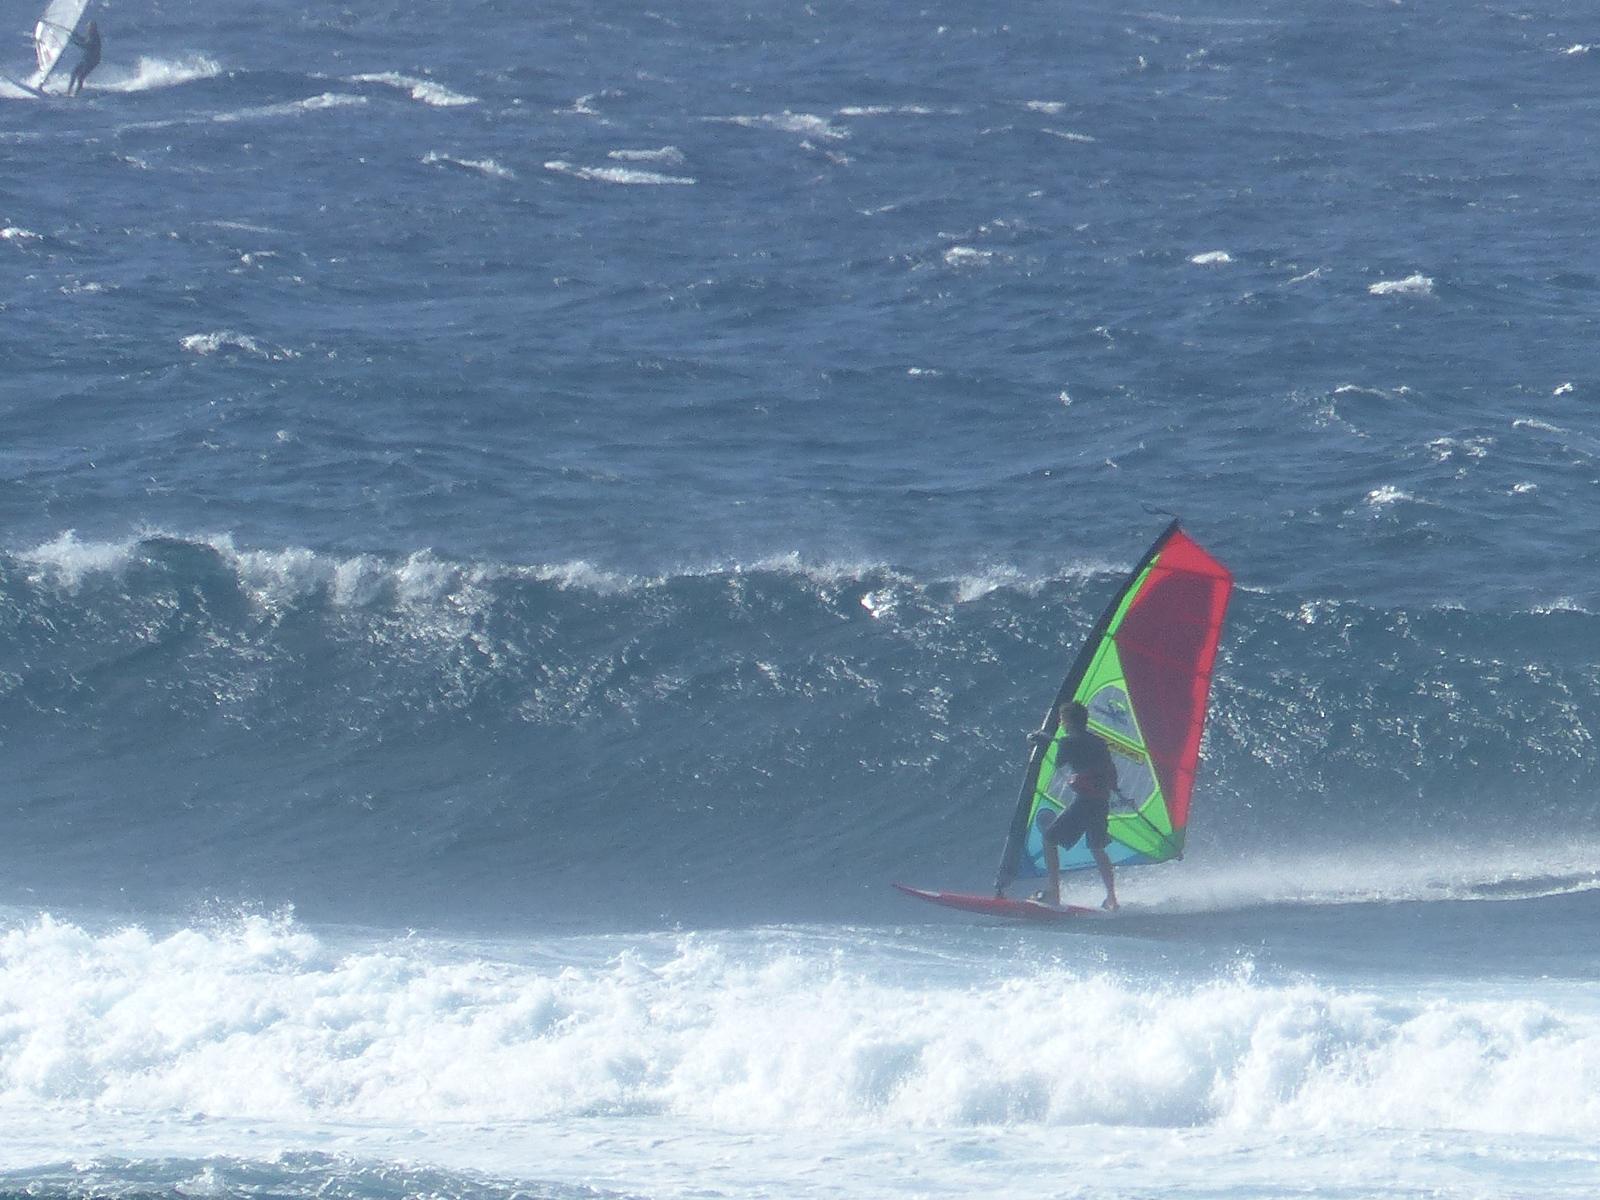 maui surf report: Friday 4 12 19 morning call